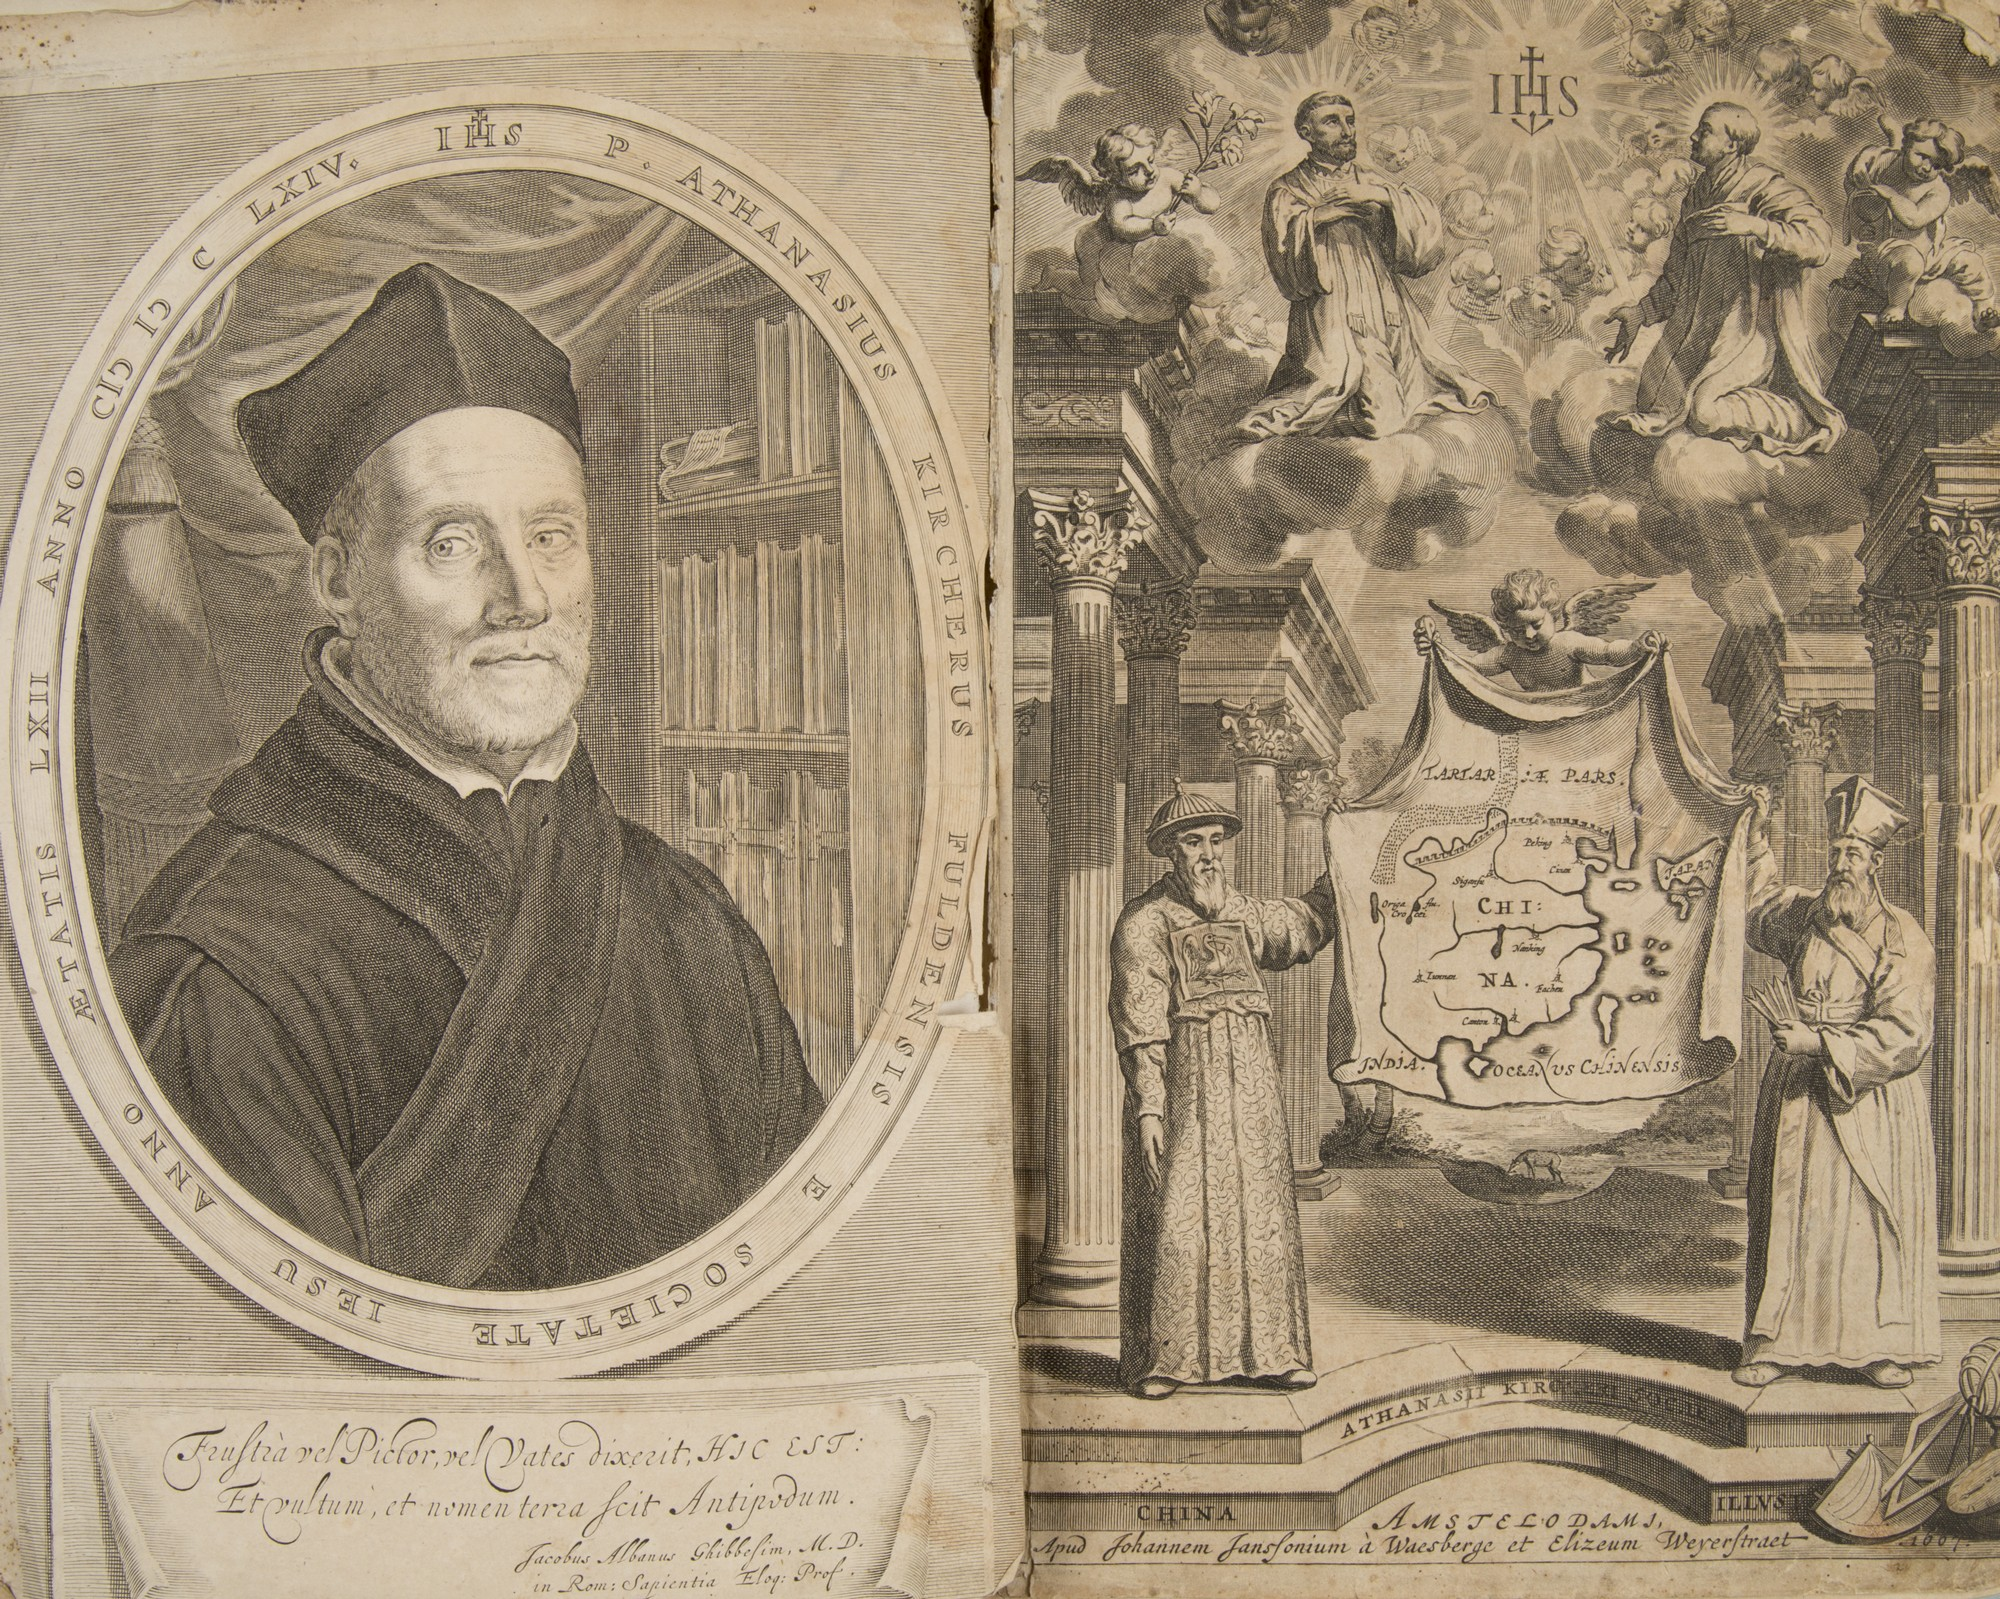 Athanasius Kircher, China Monumentis, Amsterdam, 1667 – portret autora i frontispis, fot. MNK (źródło: materiały prasowe organizatora)